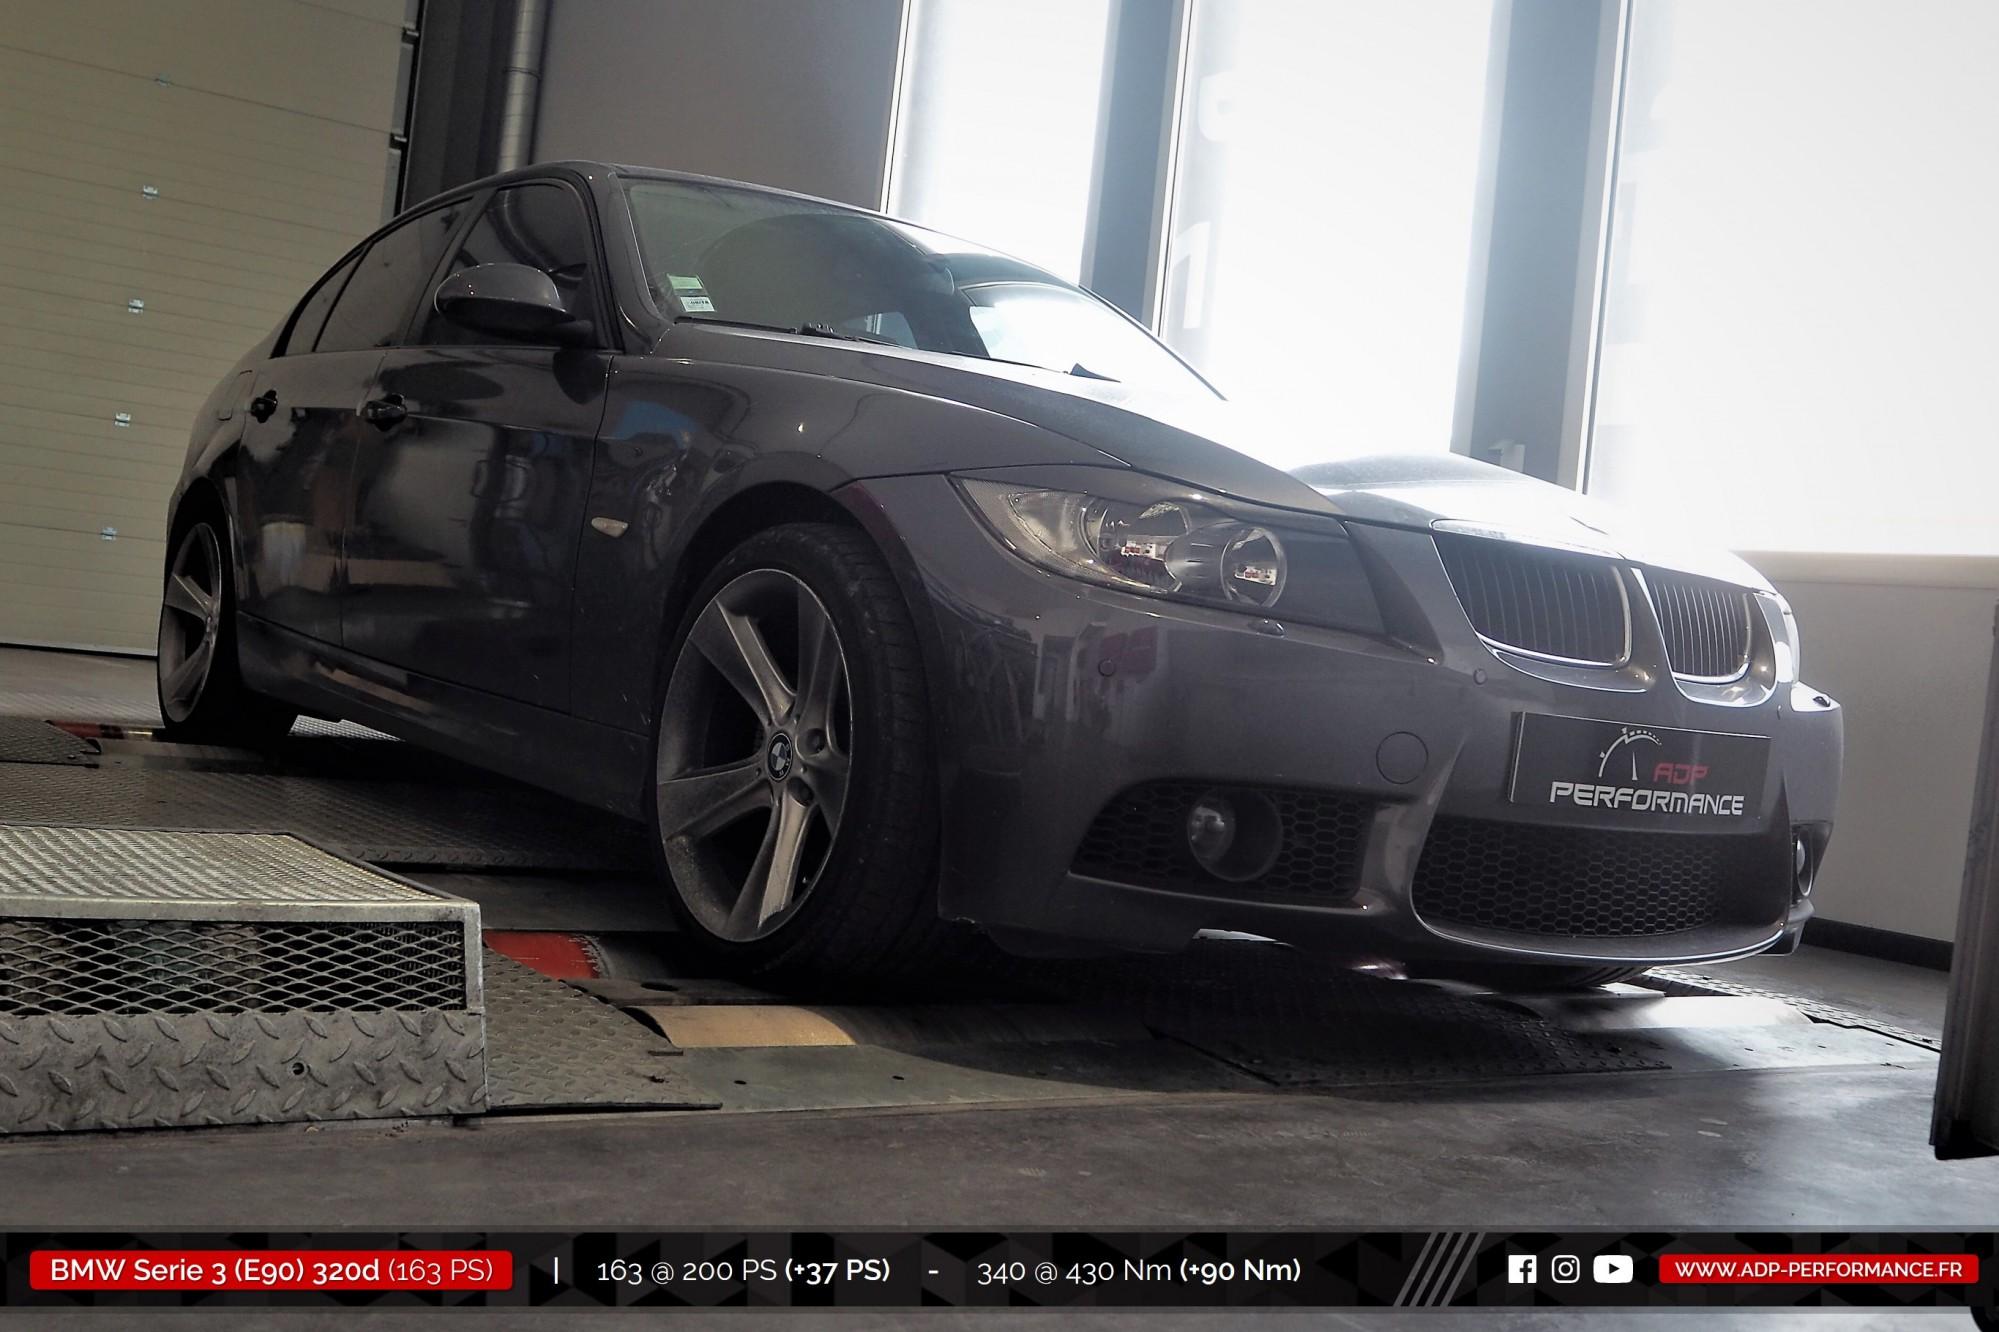 Reprogrammation moteur Miramas, Istres, Martigues - BMW Serie 3 E90 320d 163cv - ADP Performance